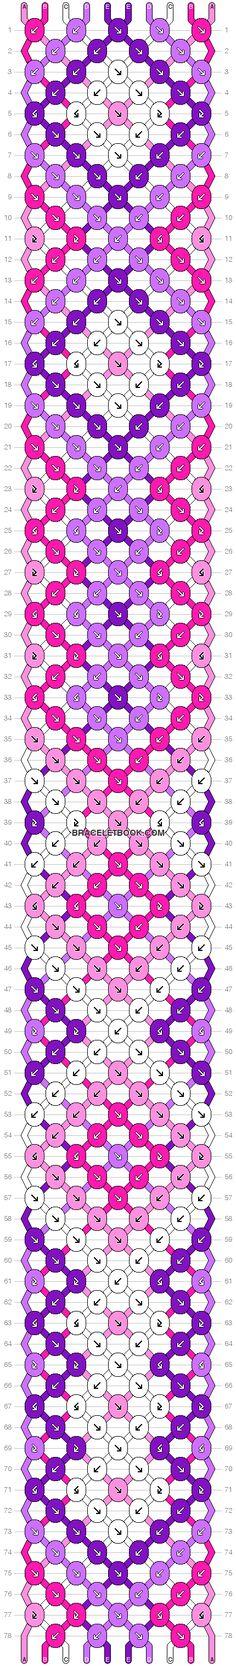 Normal Pattern #12528 added by ashuhh